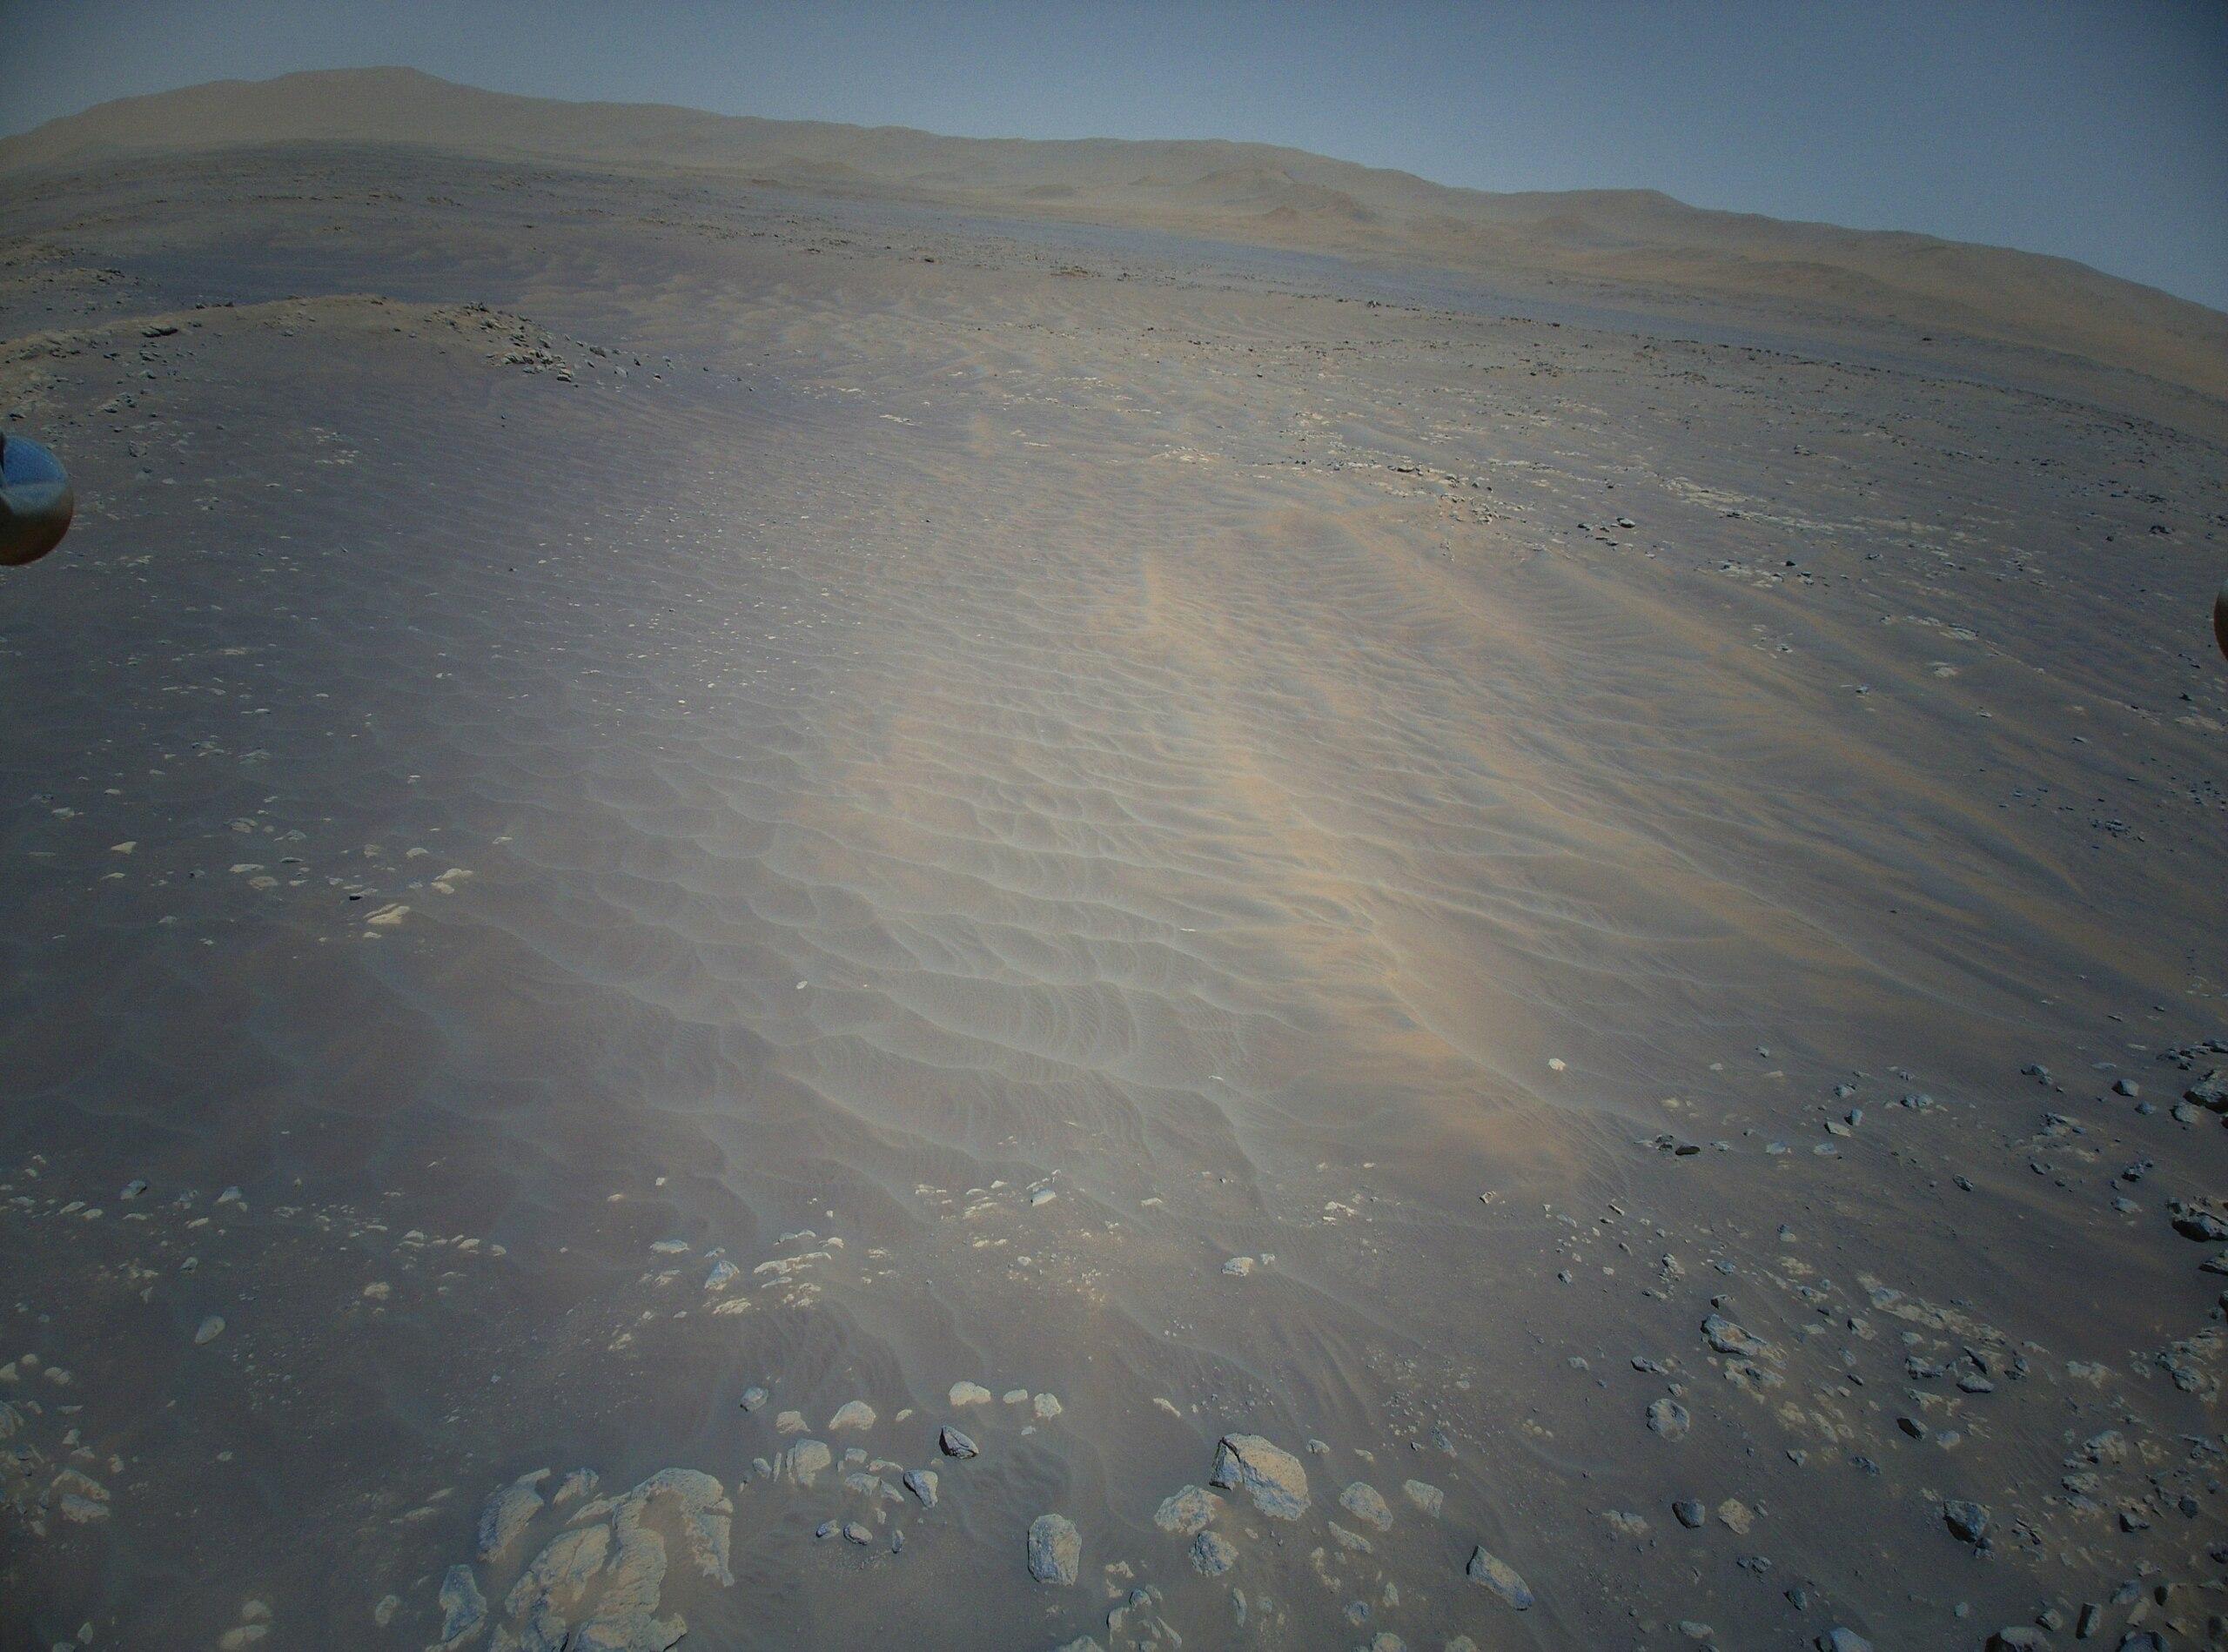 Mars 2020 (Perseverance - Ingenuity) : exploration du cratère Jezero - Page 18 12063